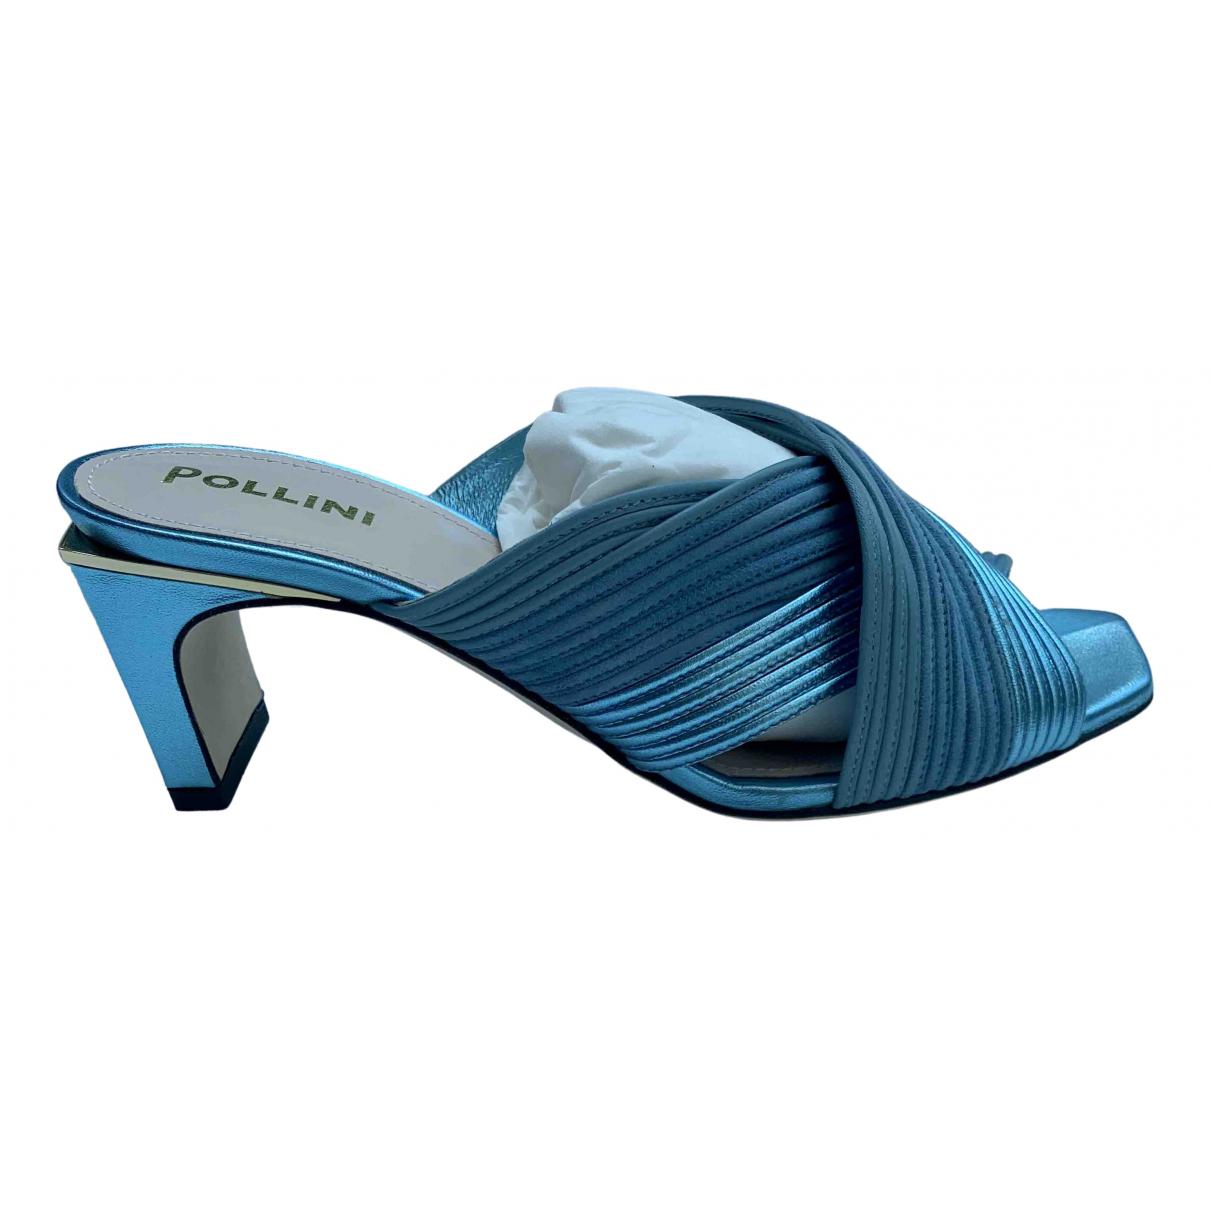 Pollini \N Sandalen in  Blau Leder